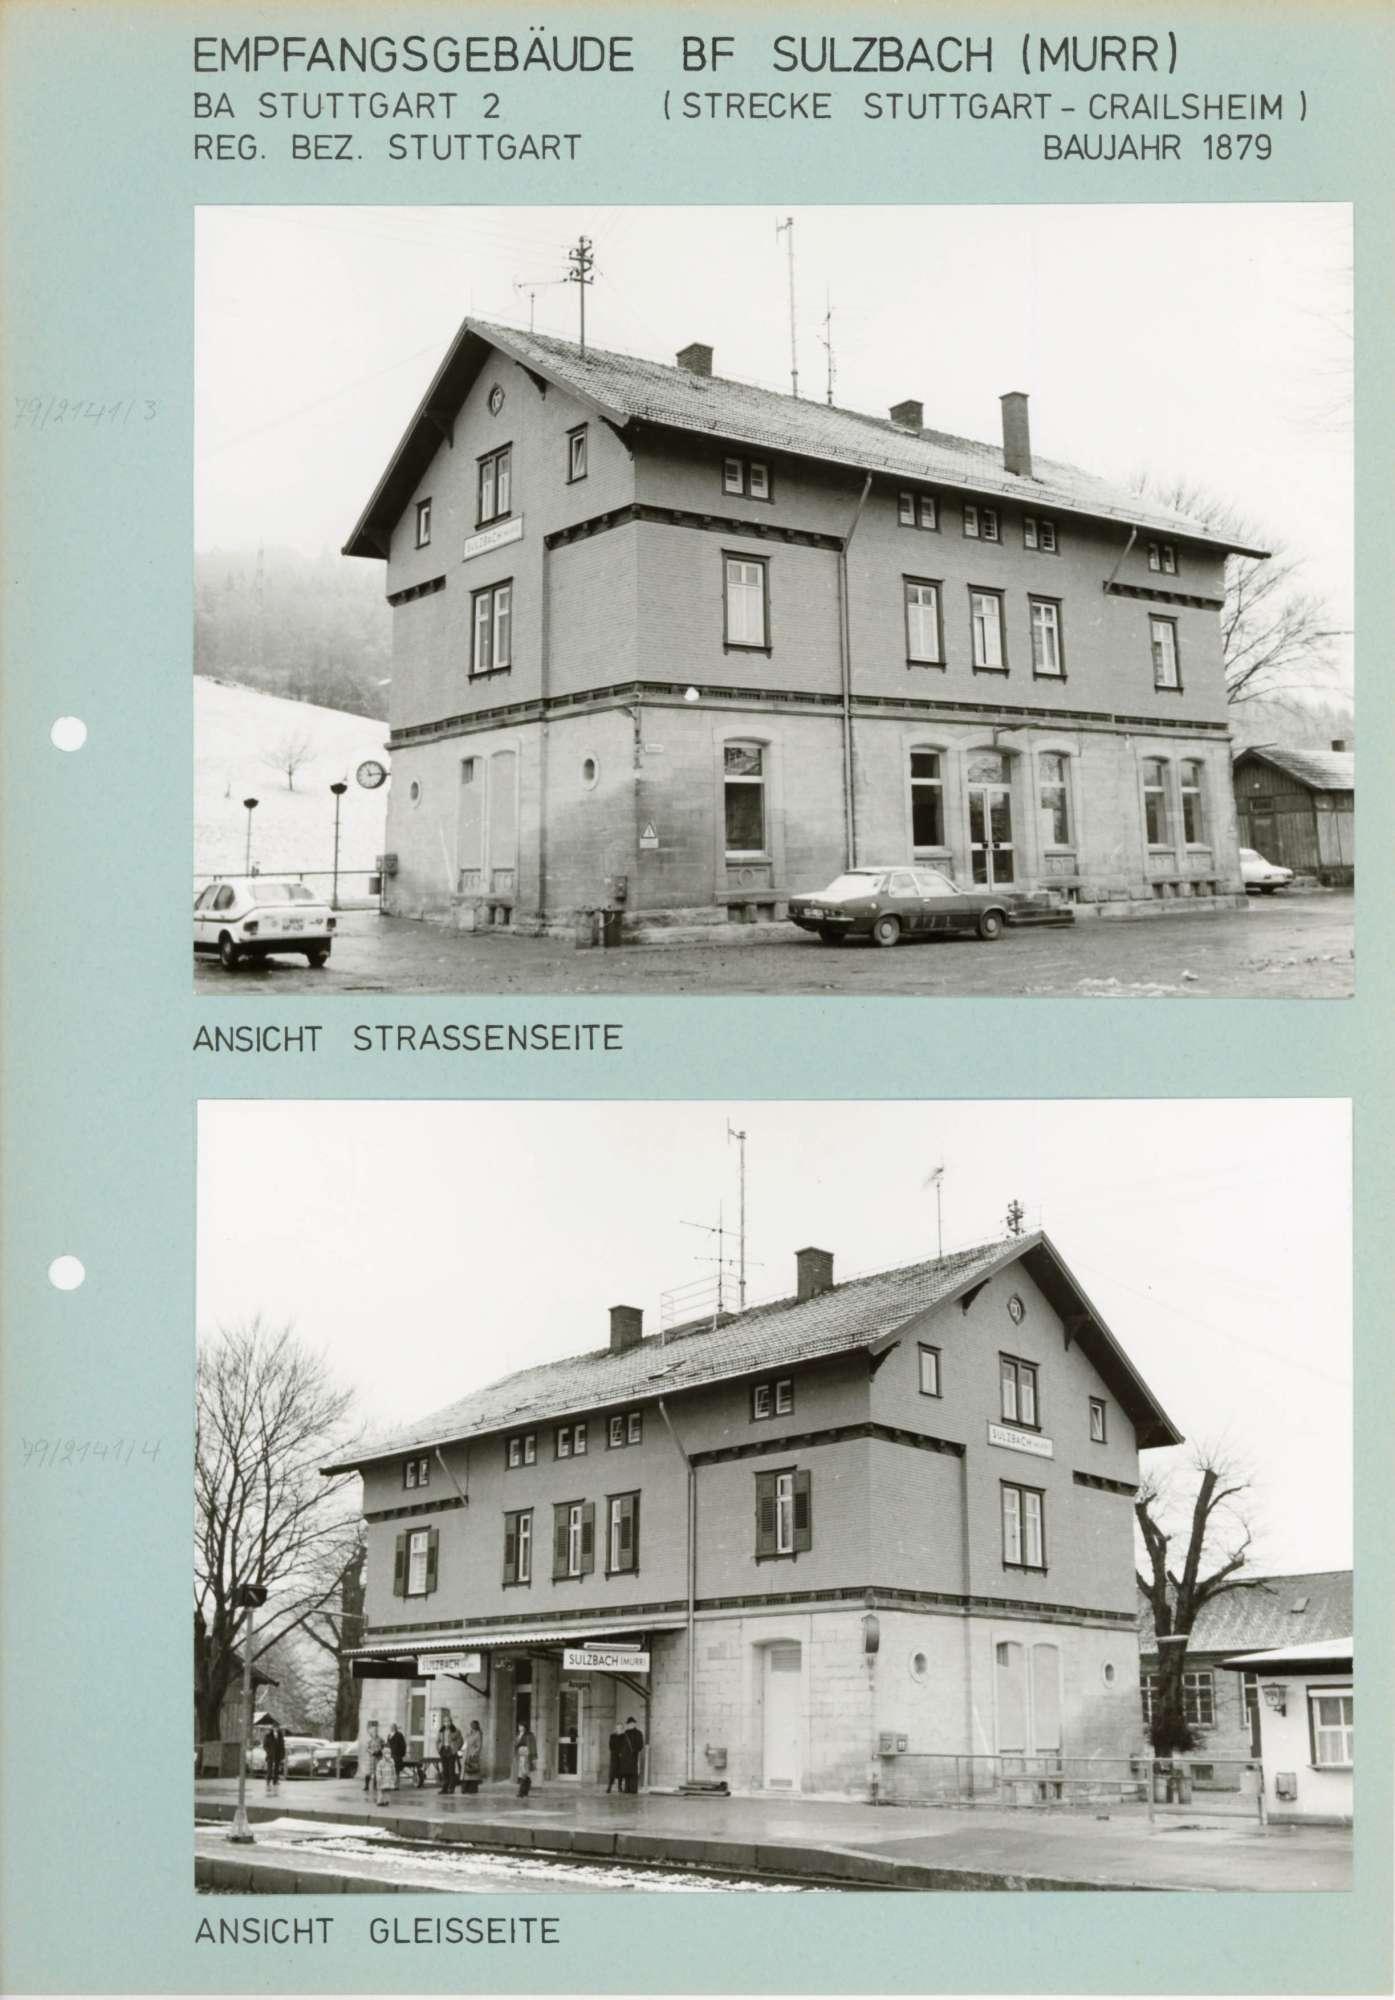 Sulzbach an der Murr: 7 Fotos, Bild 3